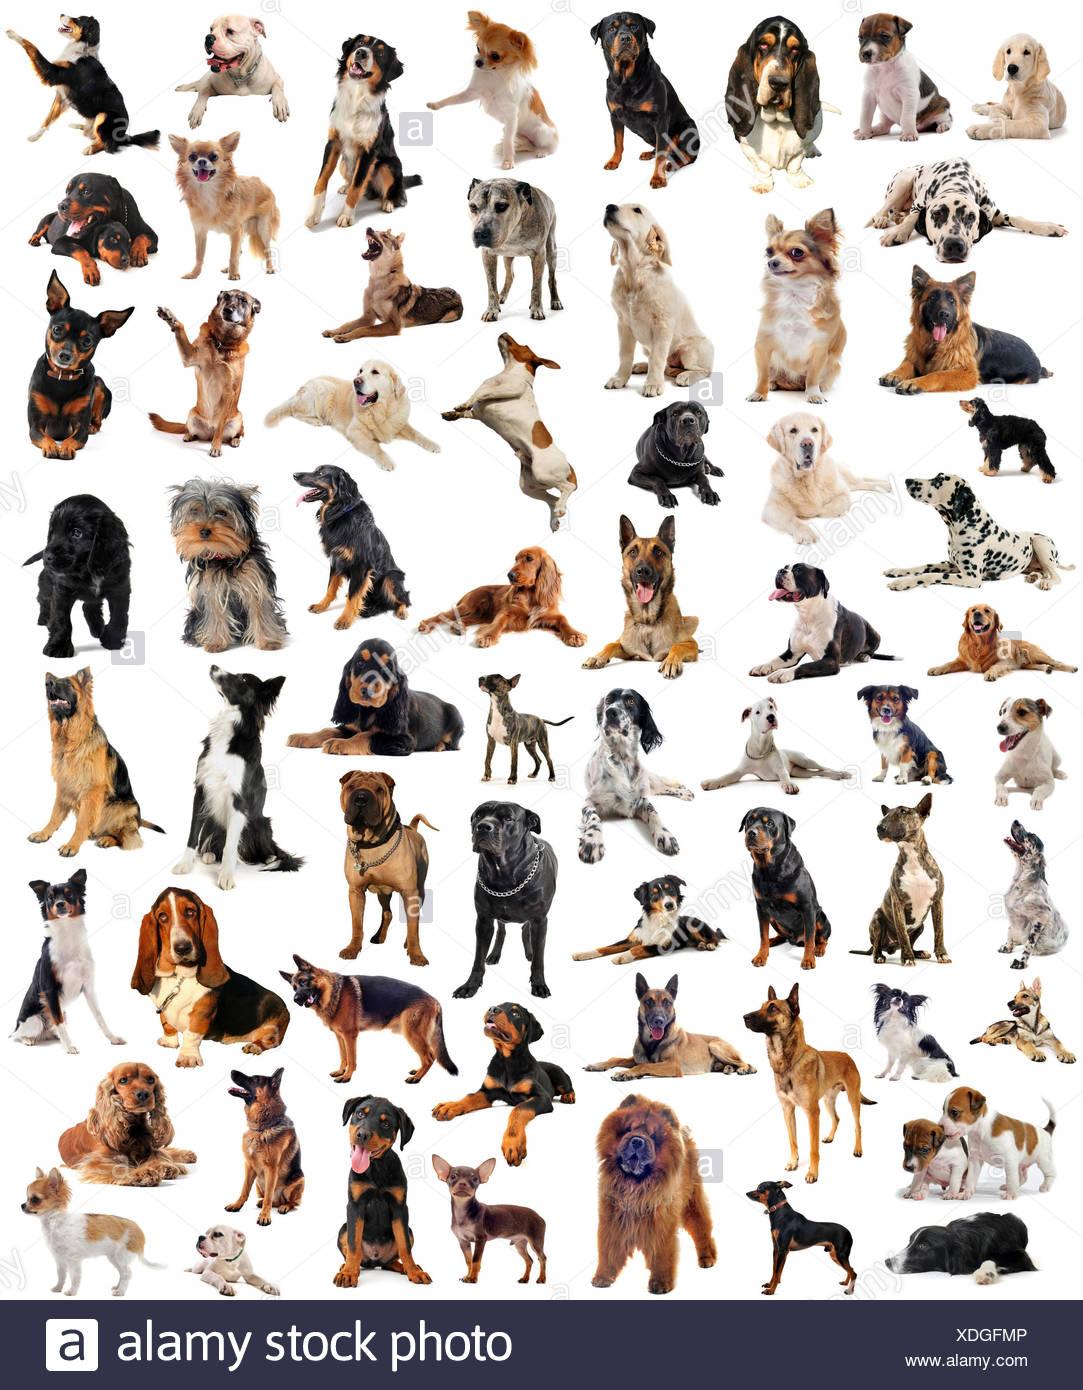 Dog Rottweiler Group Animal Pet Studio Dogs Puppy Wolf Dalmatian